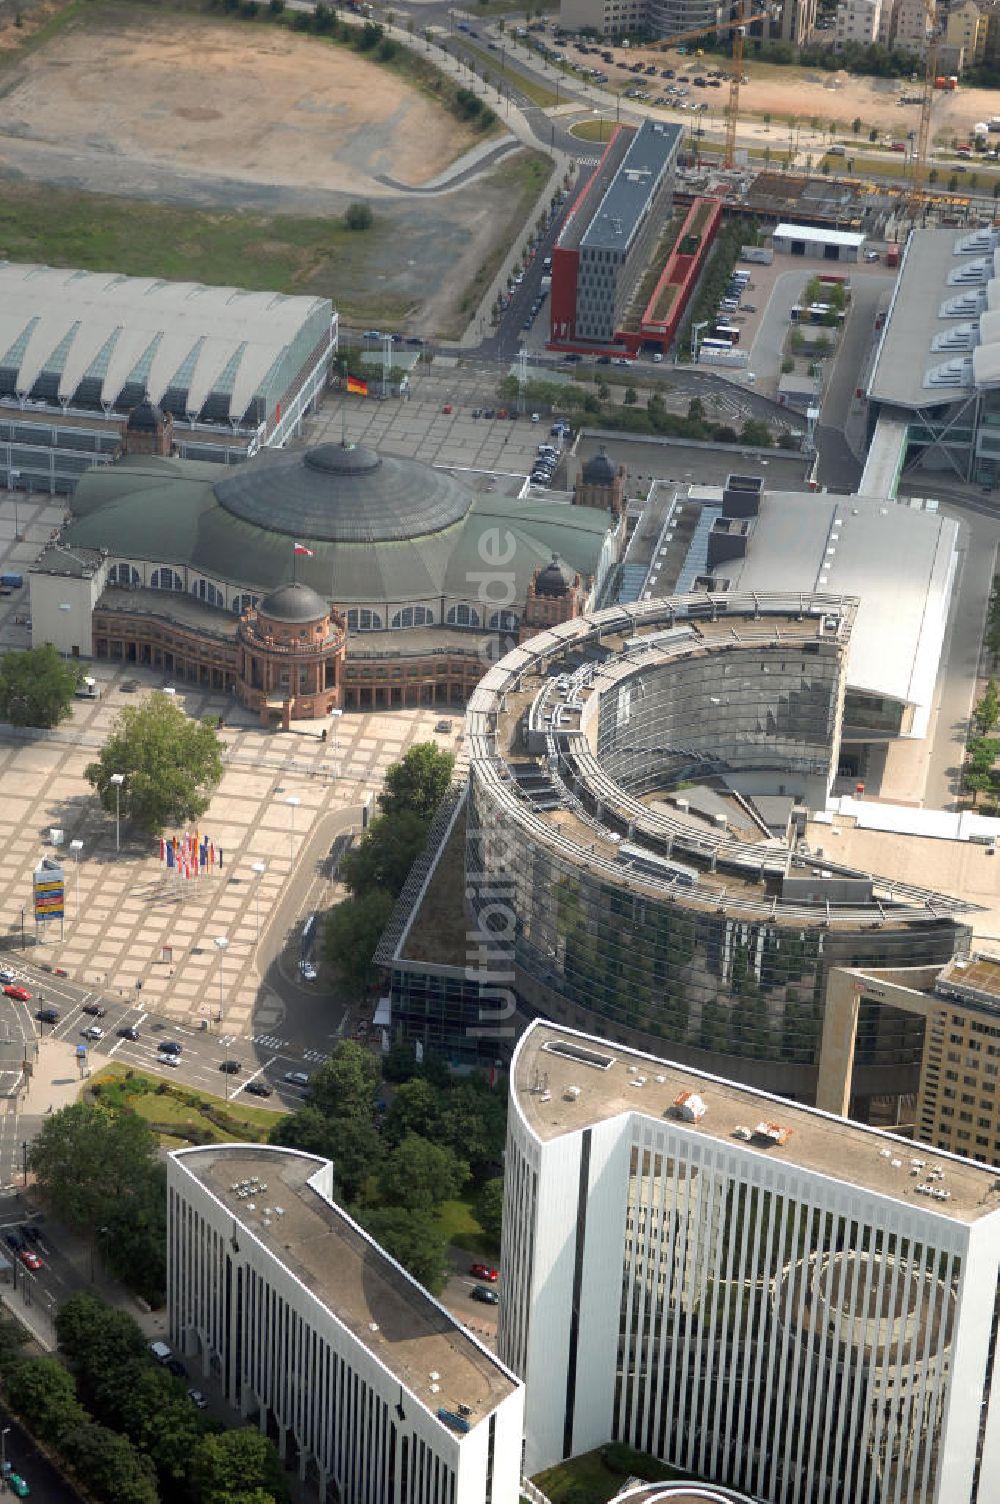 Hotel Frankfurt Festhalle